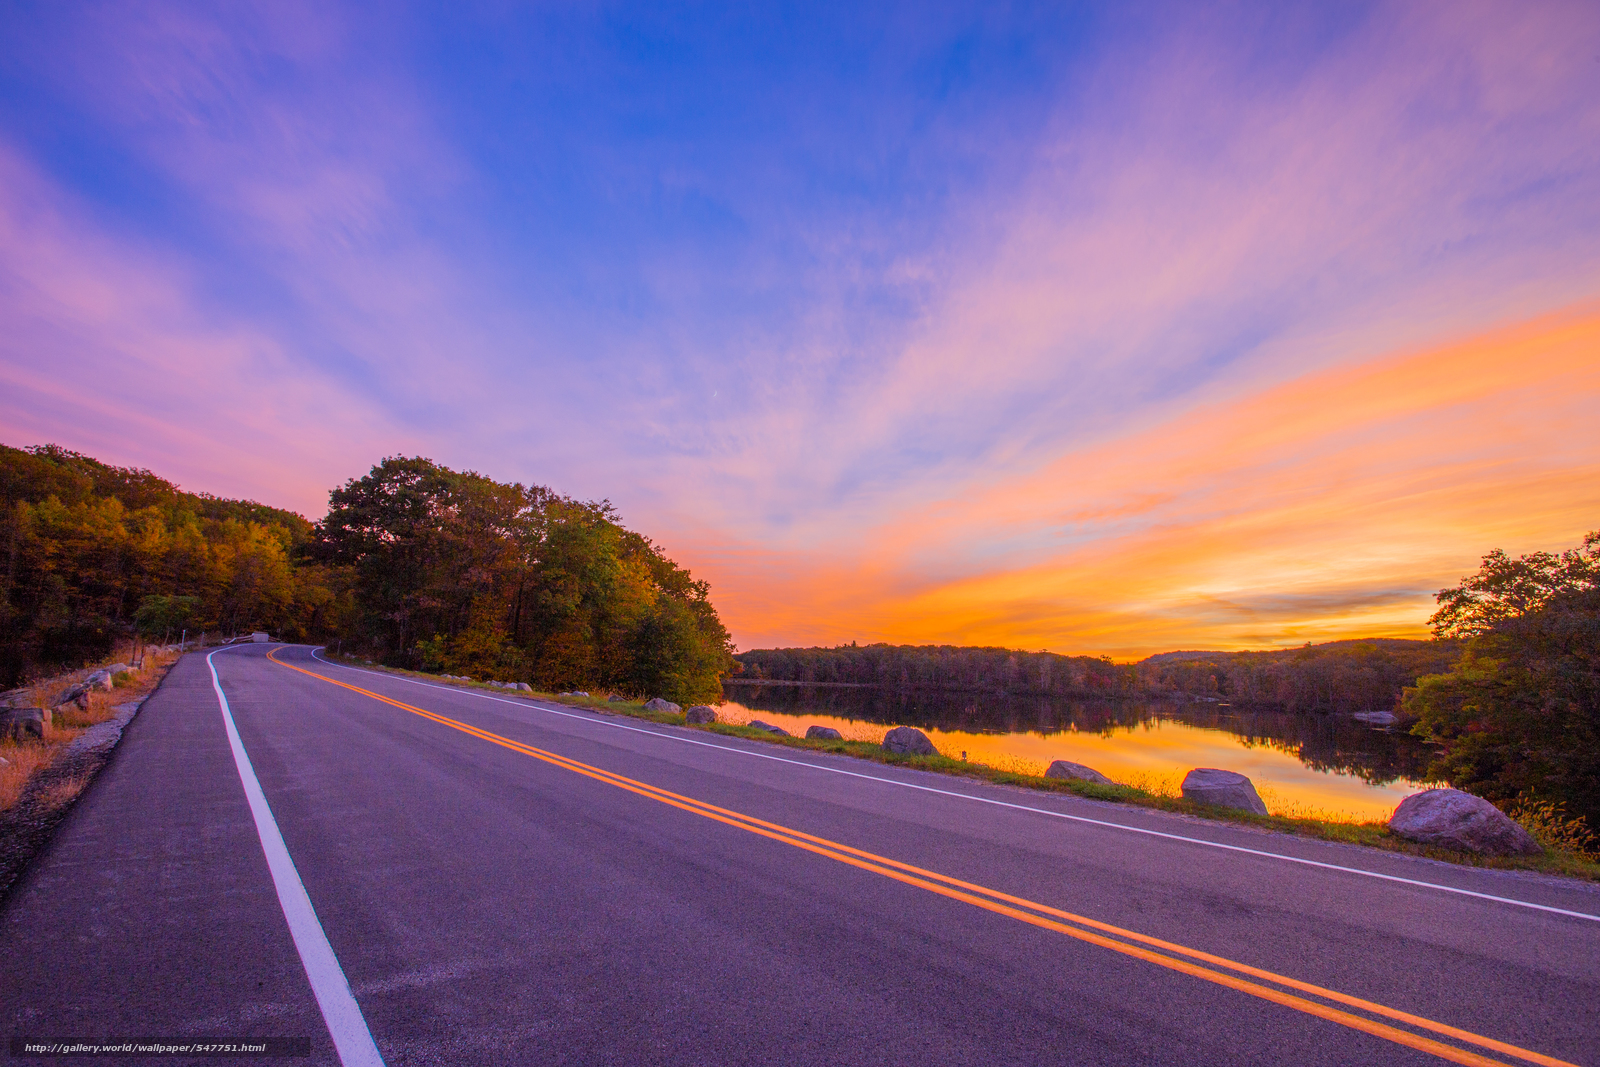 Download wallpaper sunset road lake trees free desktop - Wallpaper picture ...